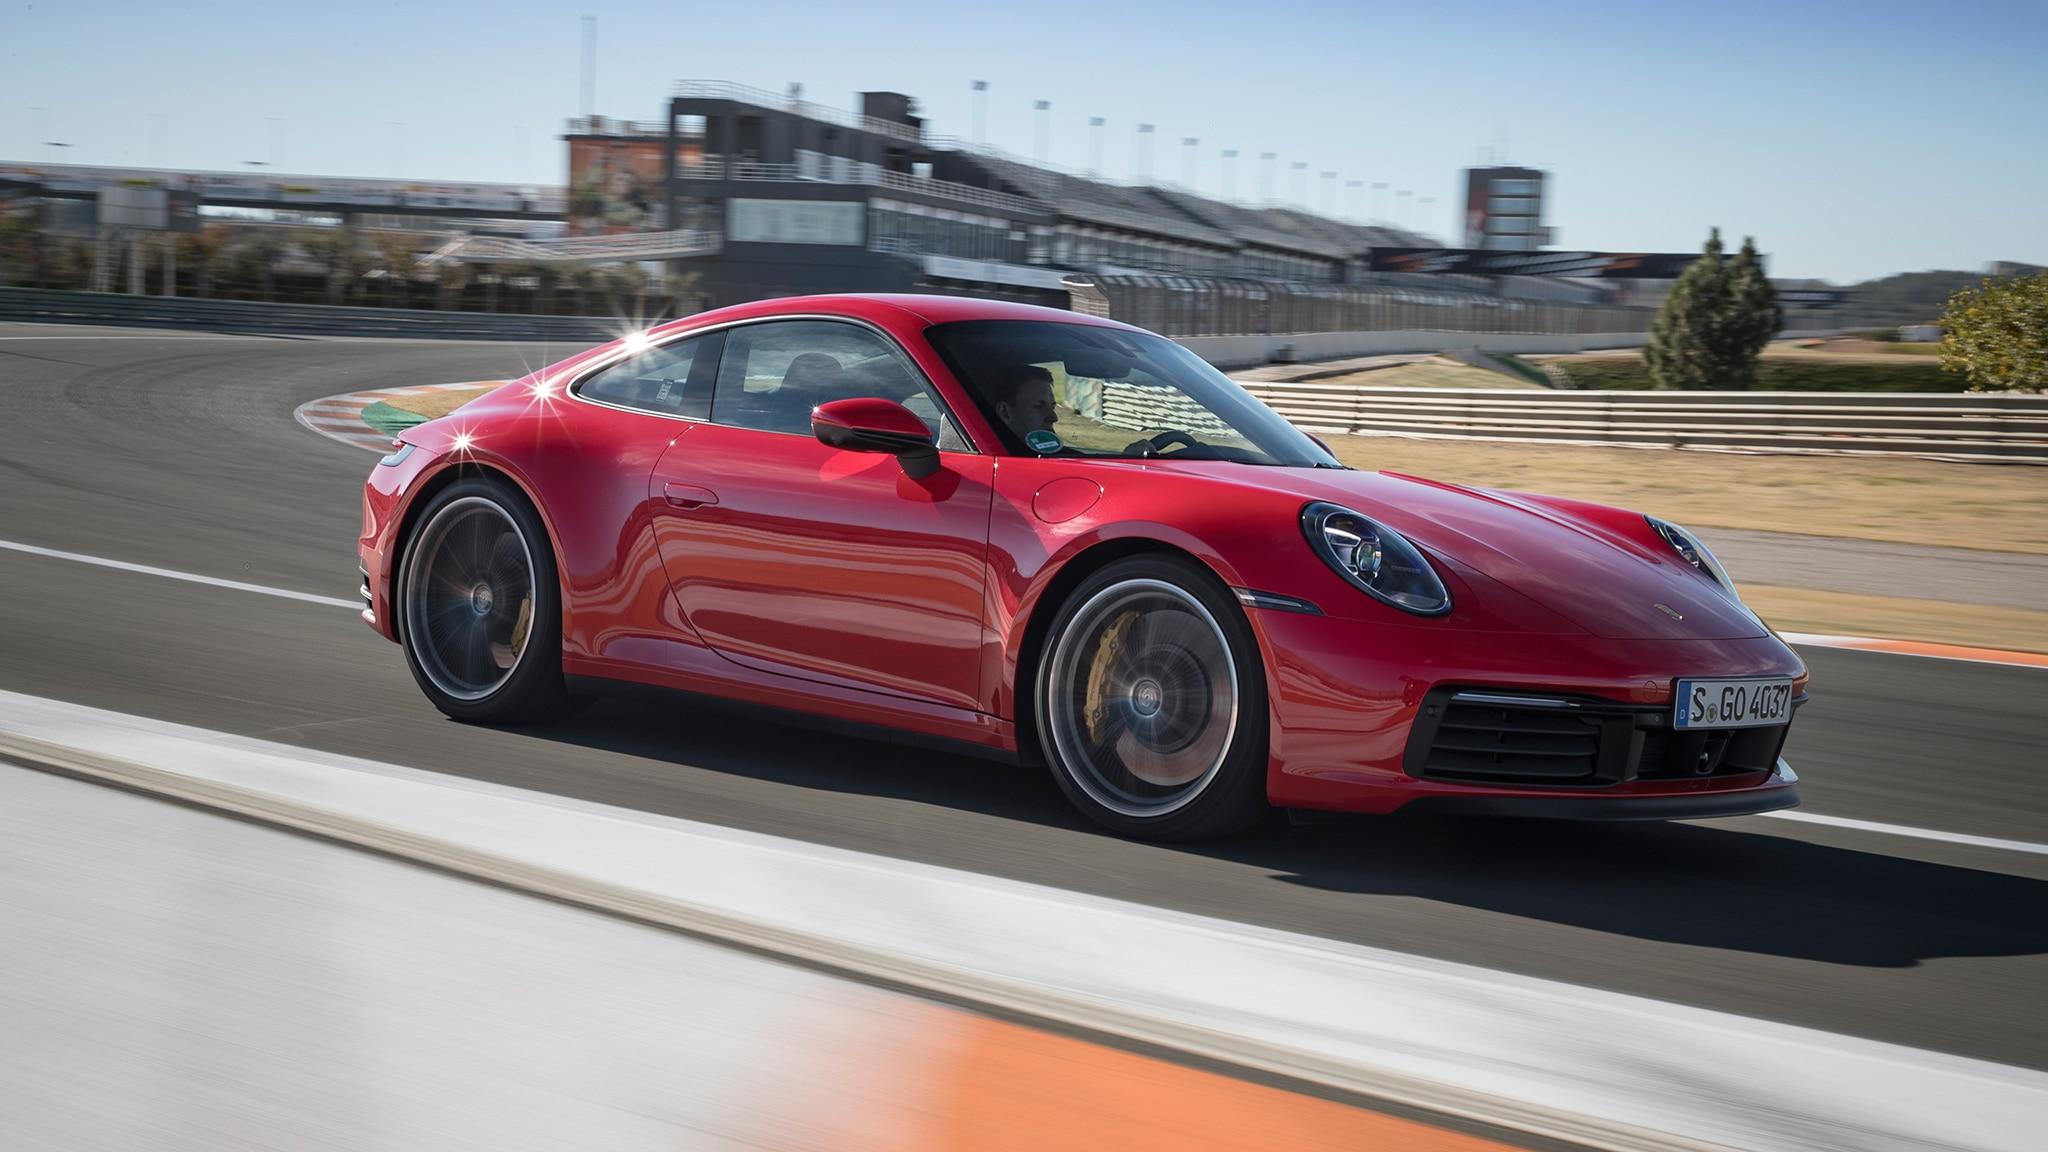 2020 porsche 911 carrera s first drive review it 39 s unshakeable automobile magazine